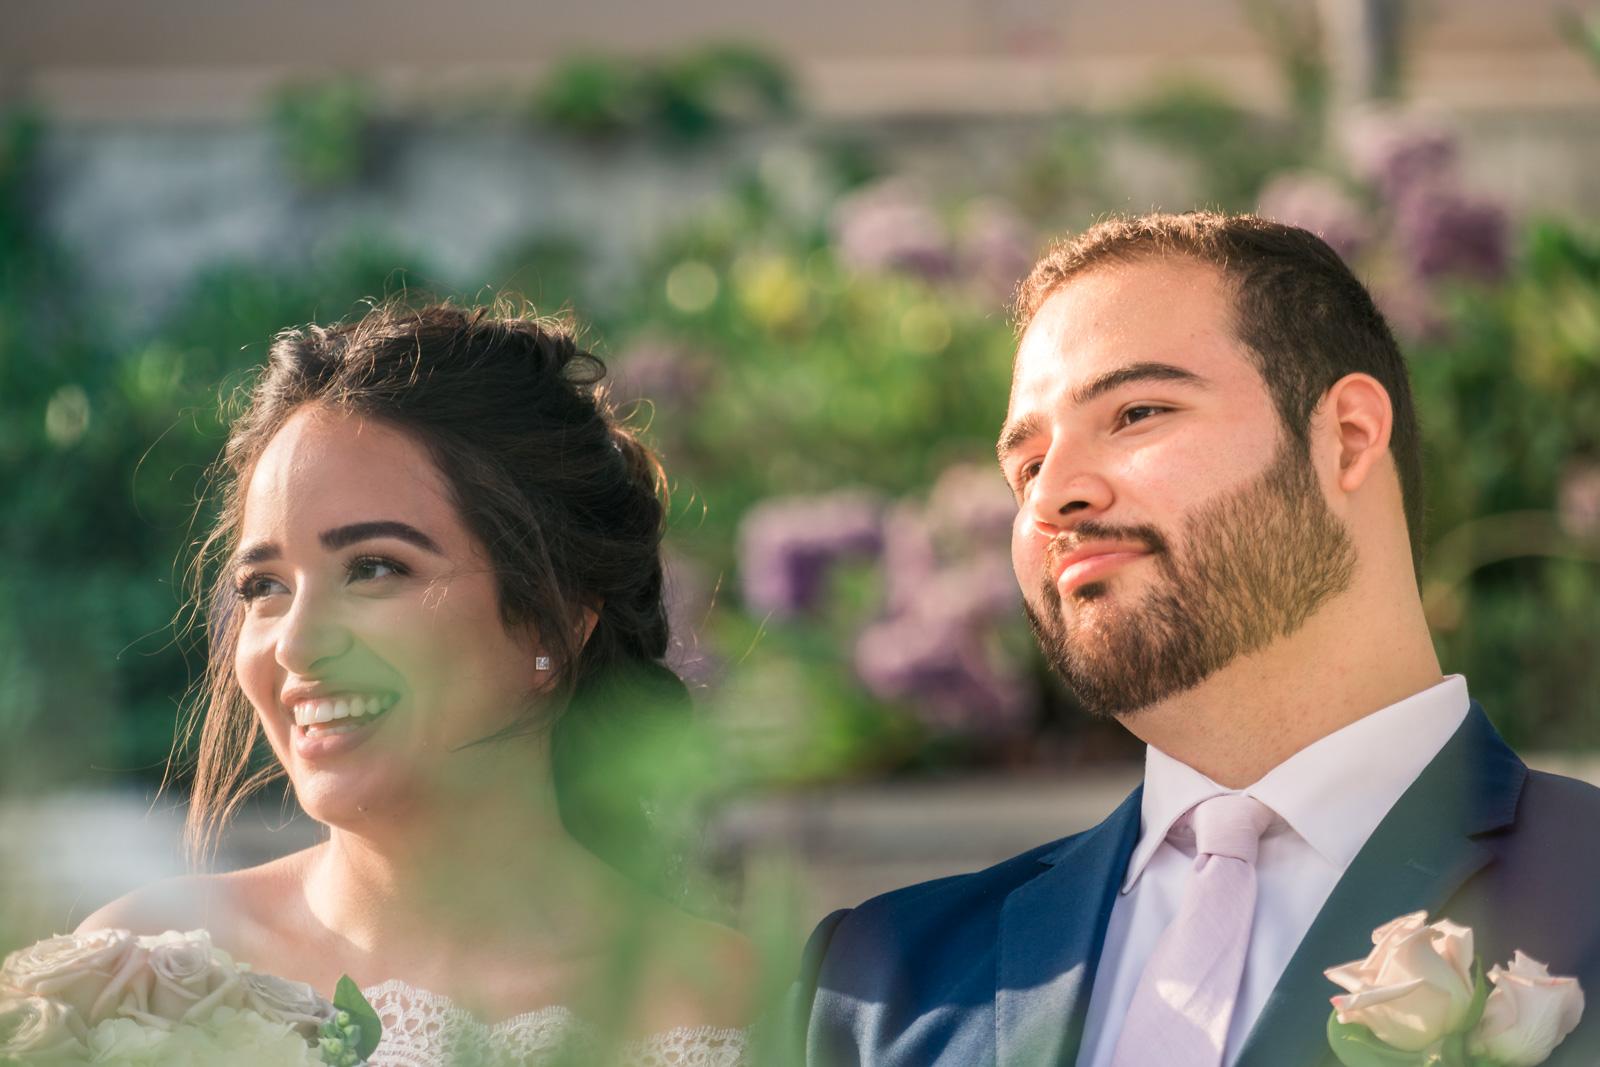 200_Angel-Brea-Orange-County_Joseph-Barber-Wedding-Photography.jpg